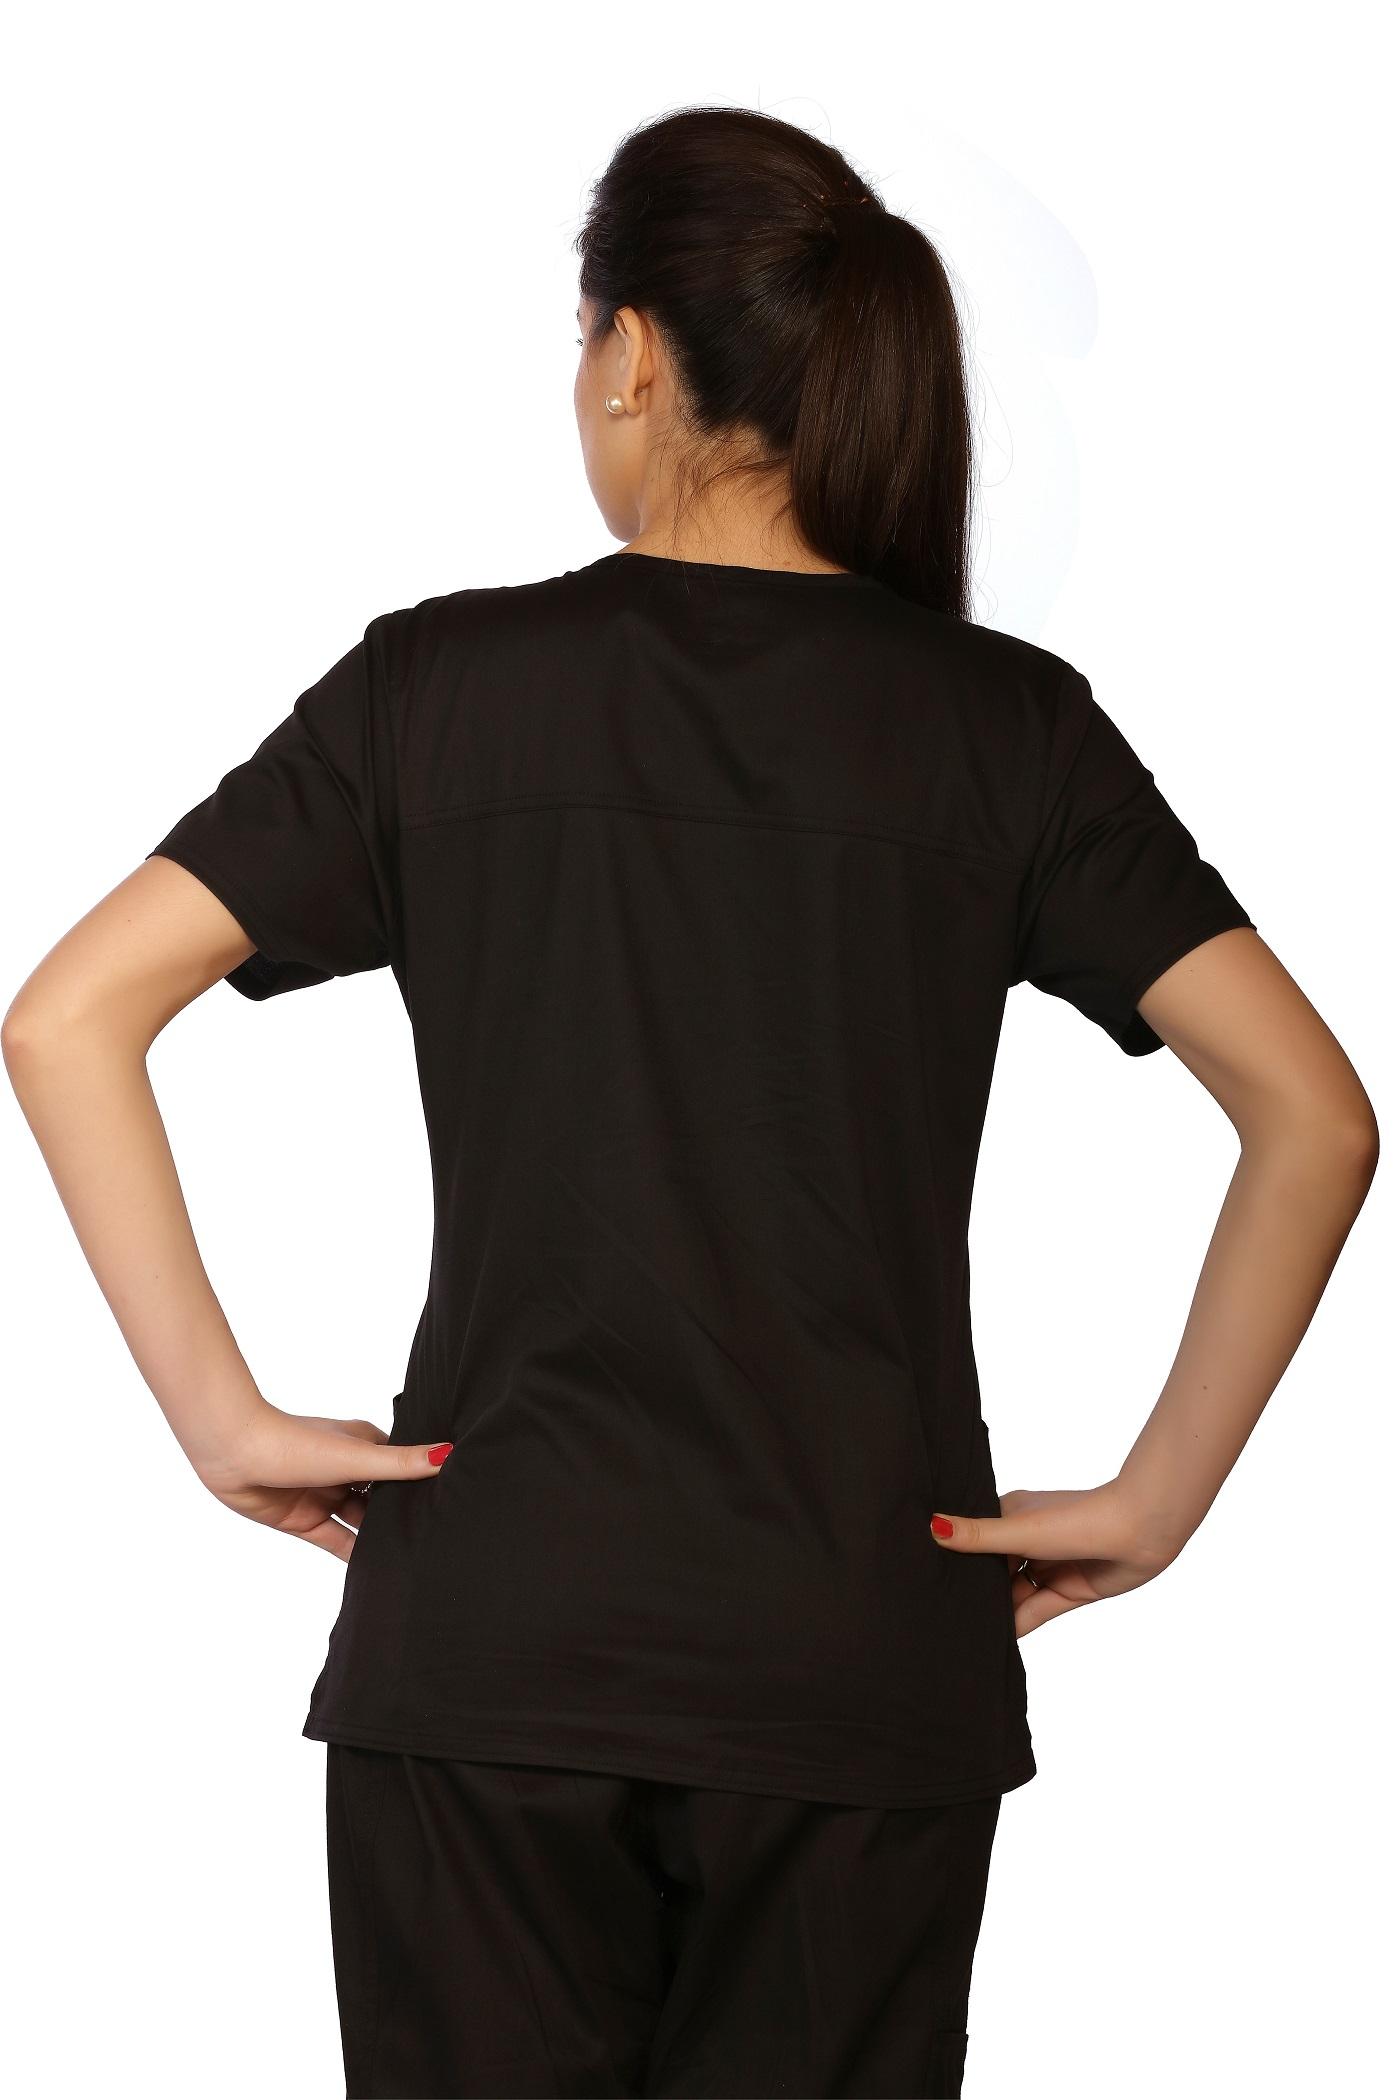 Womens Stretch V-Neck Top, LifeThreads Contego Collection